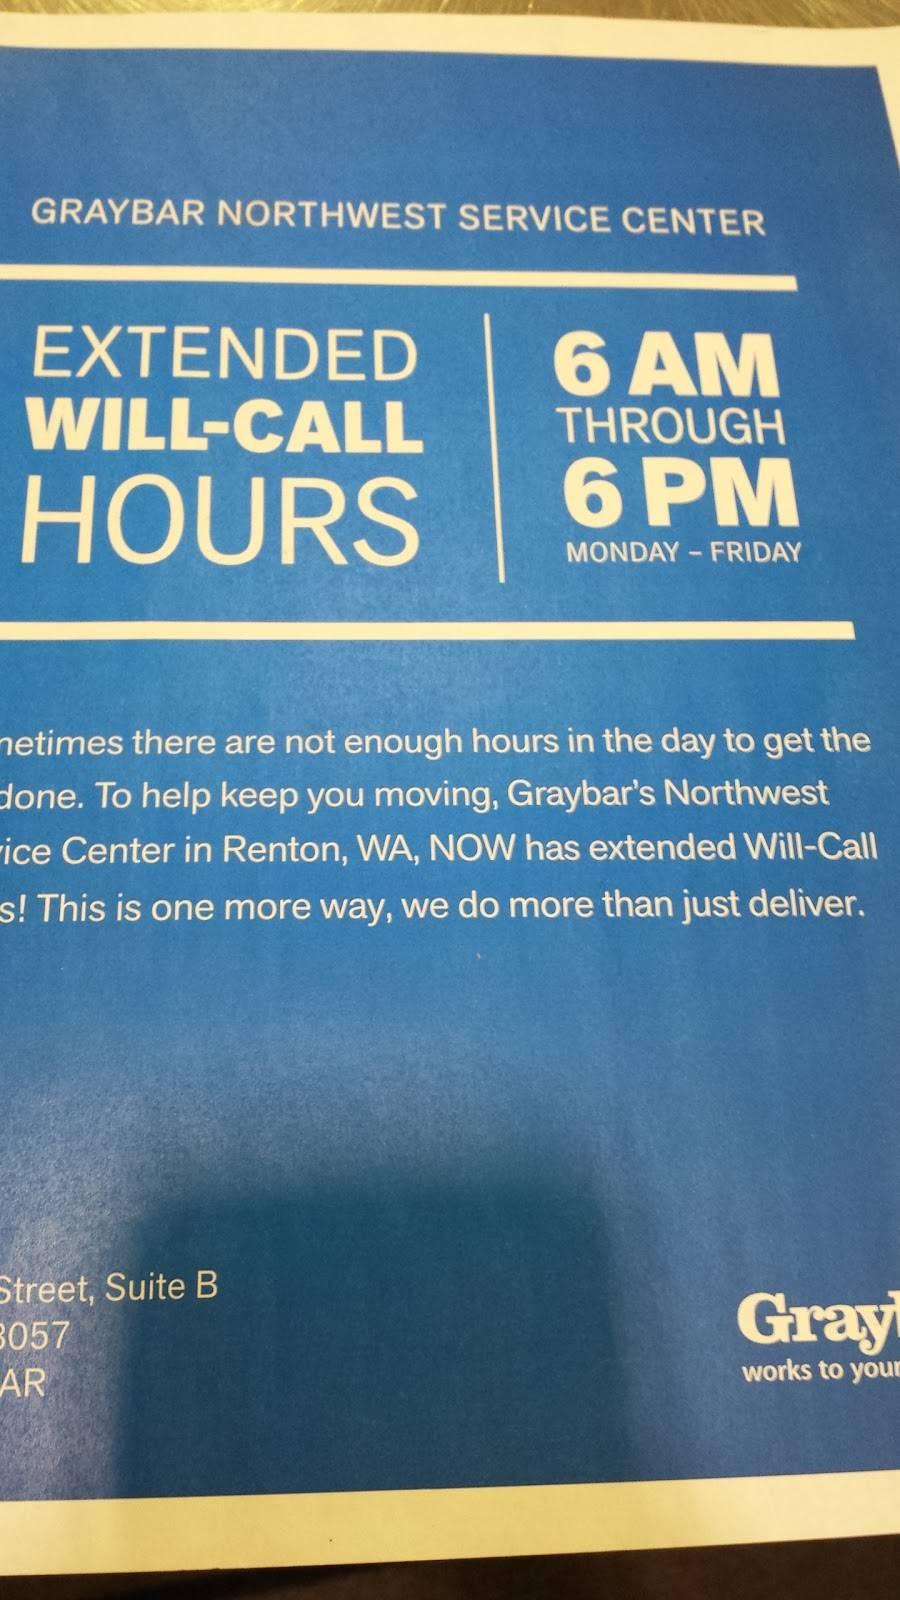 Graybar Electric Supply - store  | Photo 6 of 7 | Address: 300 SW 27th St Ste B, Renton, WA 98057, USA | Phone: (425) 203-1500